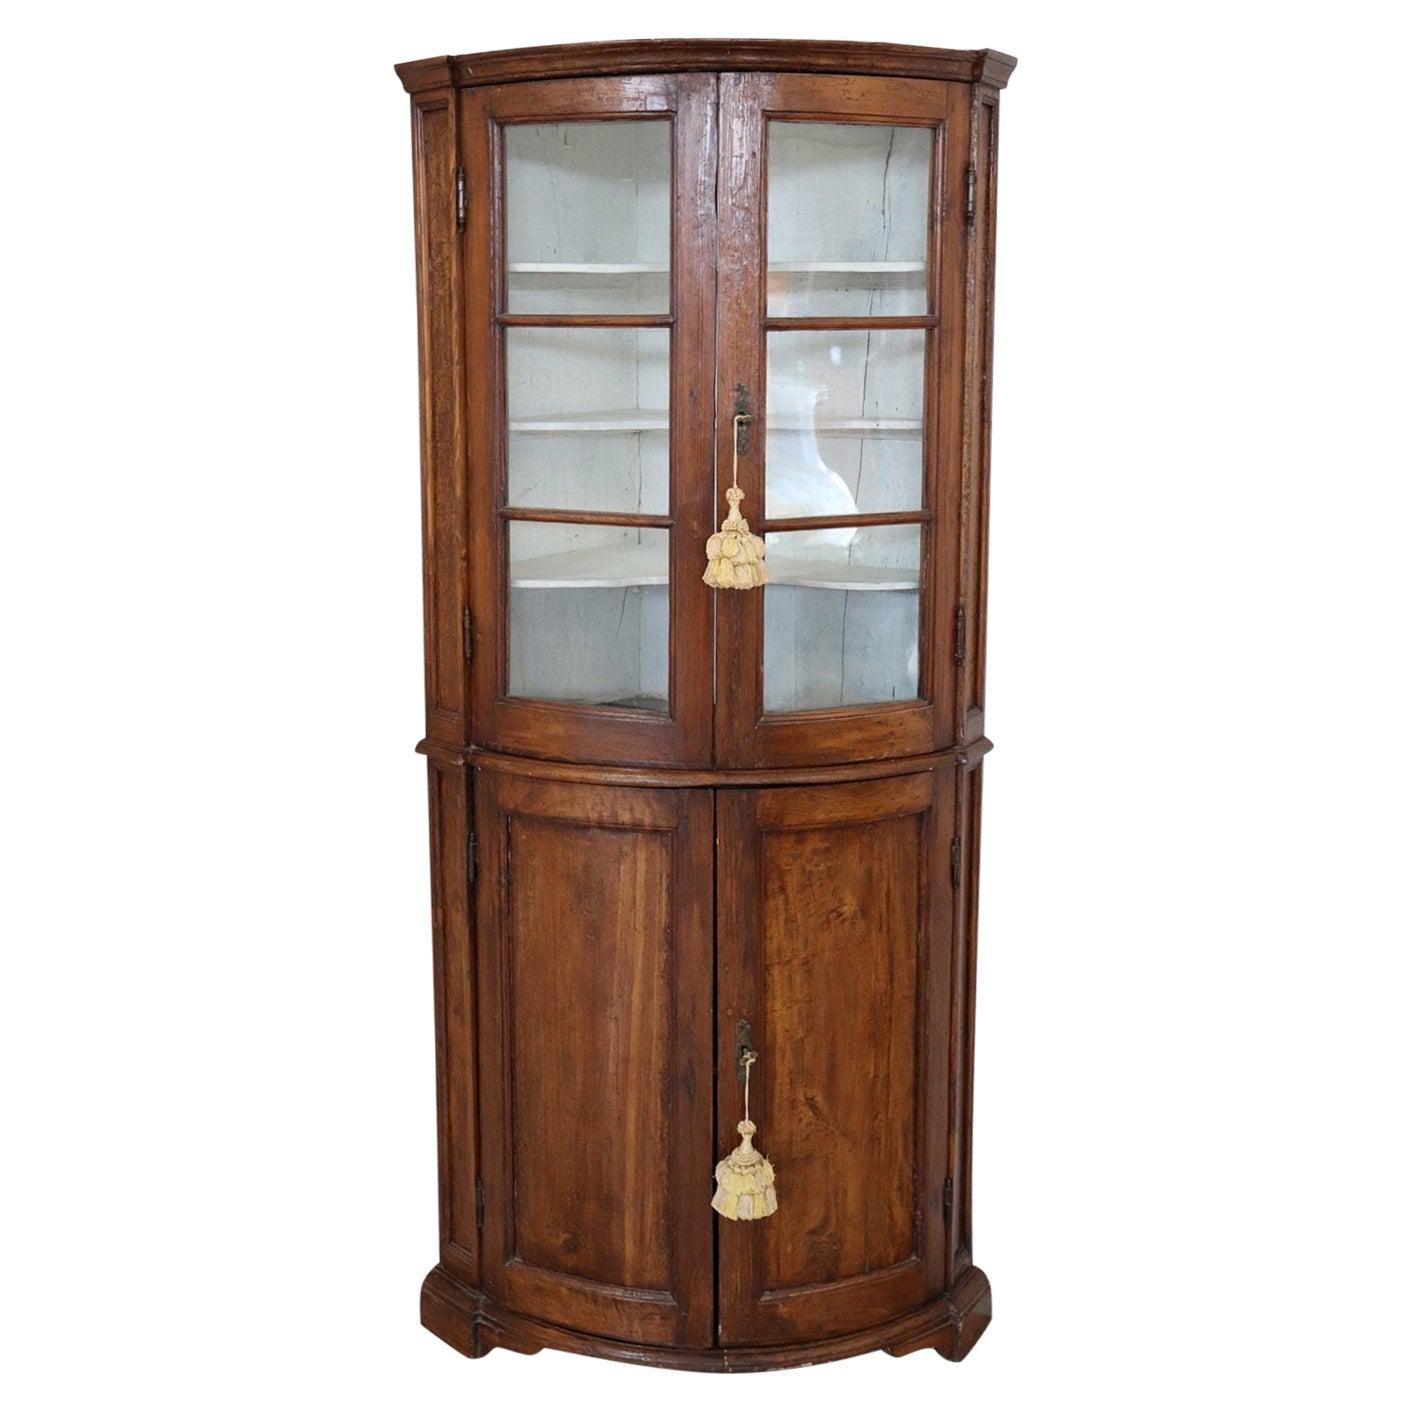 18th Century Italian Antique Corner Cupboard or Corner Cabinet in Poplar Wood